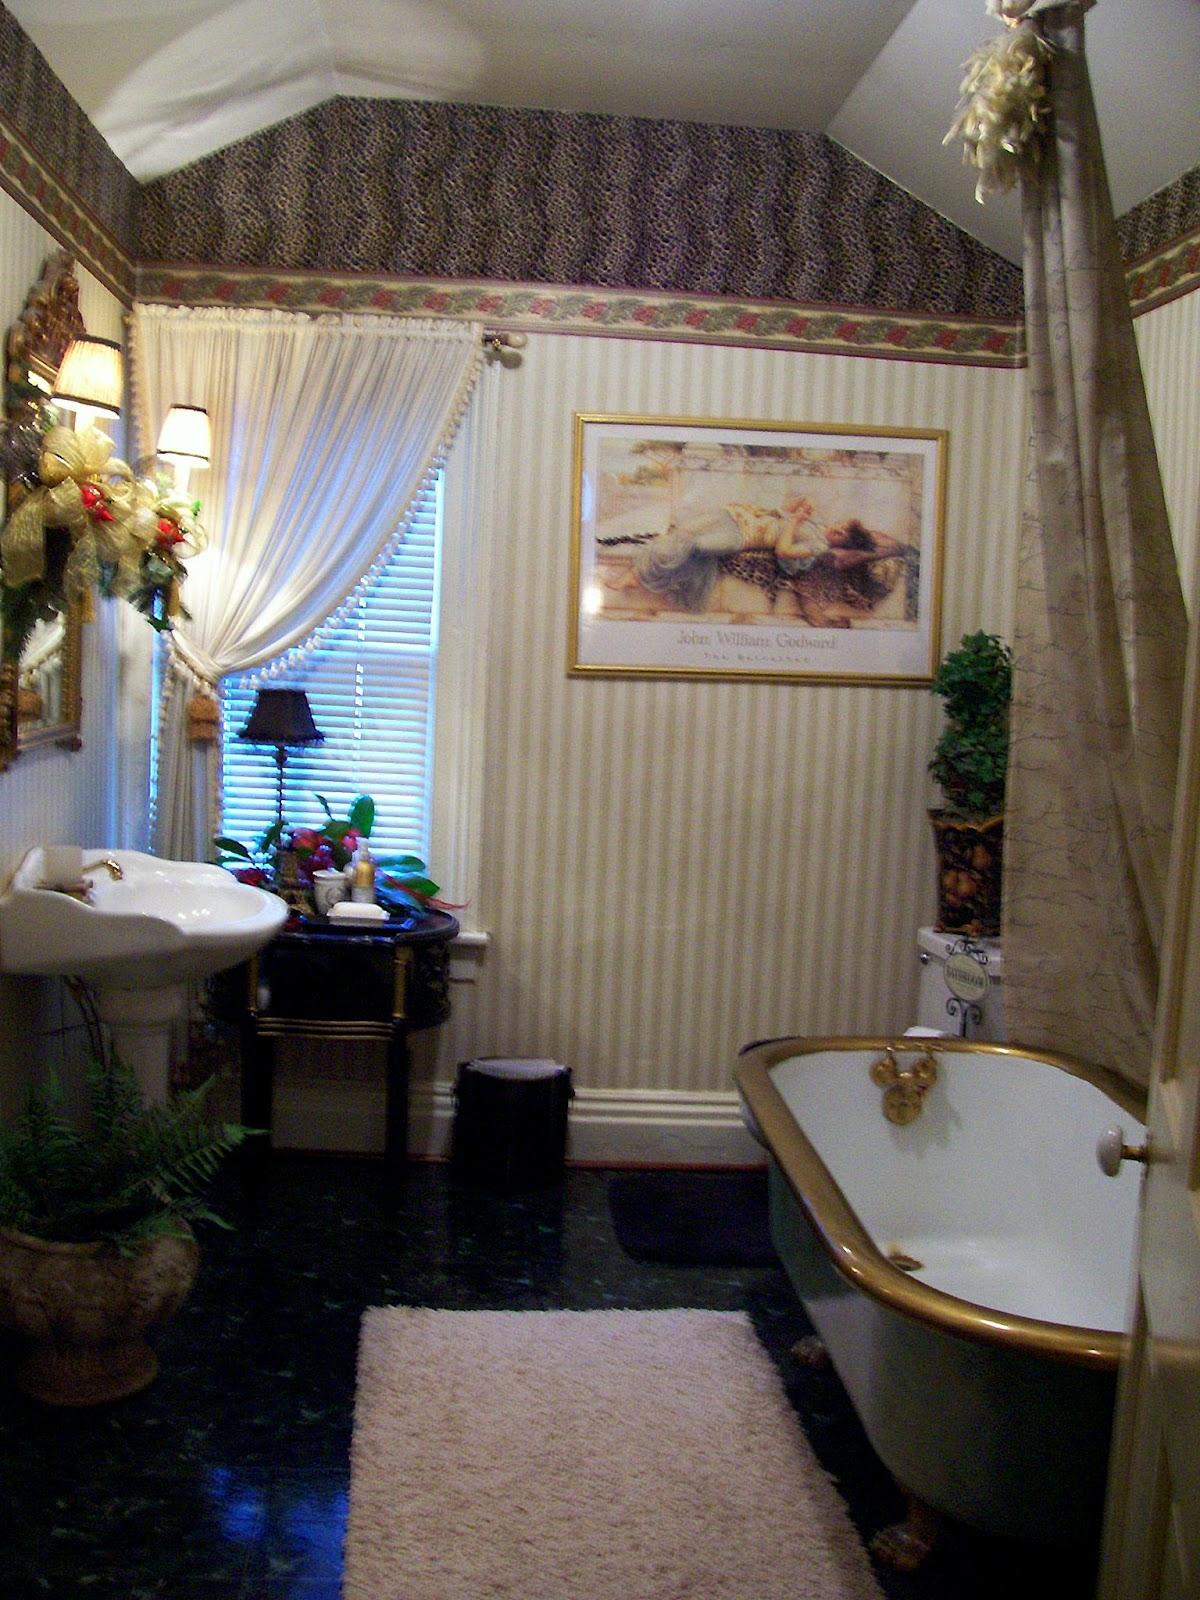 http://4.bp.blogspot.com/-iexjeEzF2LM/T8rZK-_s7BI/AAAAAAAAAfM/BtXo_9typaY/s1600/(Number+1)Bathroom+2.JPG